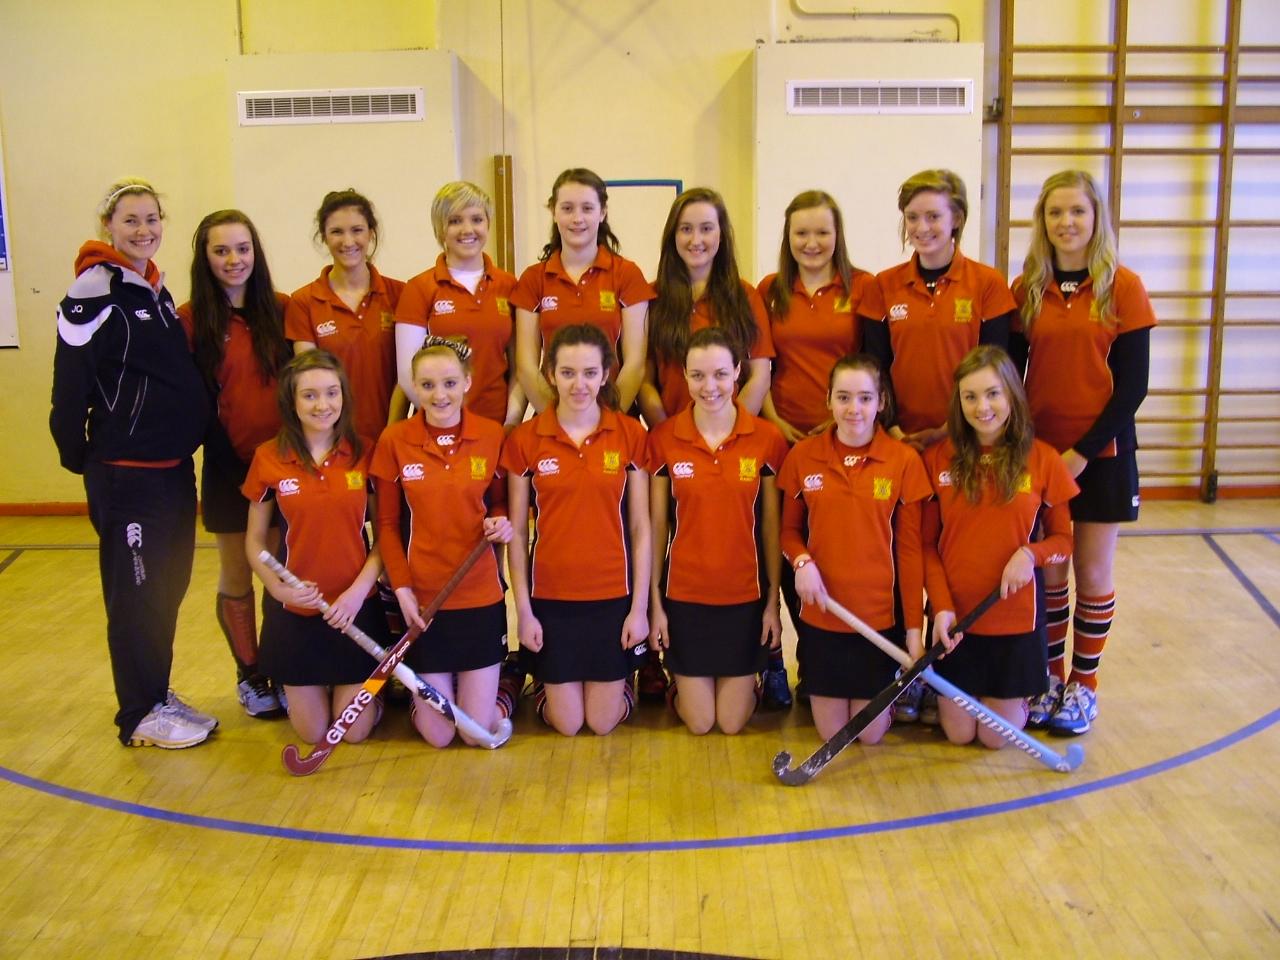 rainey hockey girls reach 4 ulster schools finals